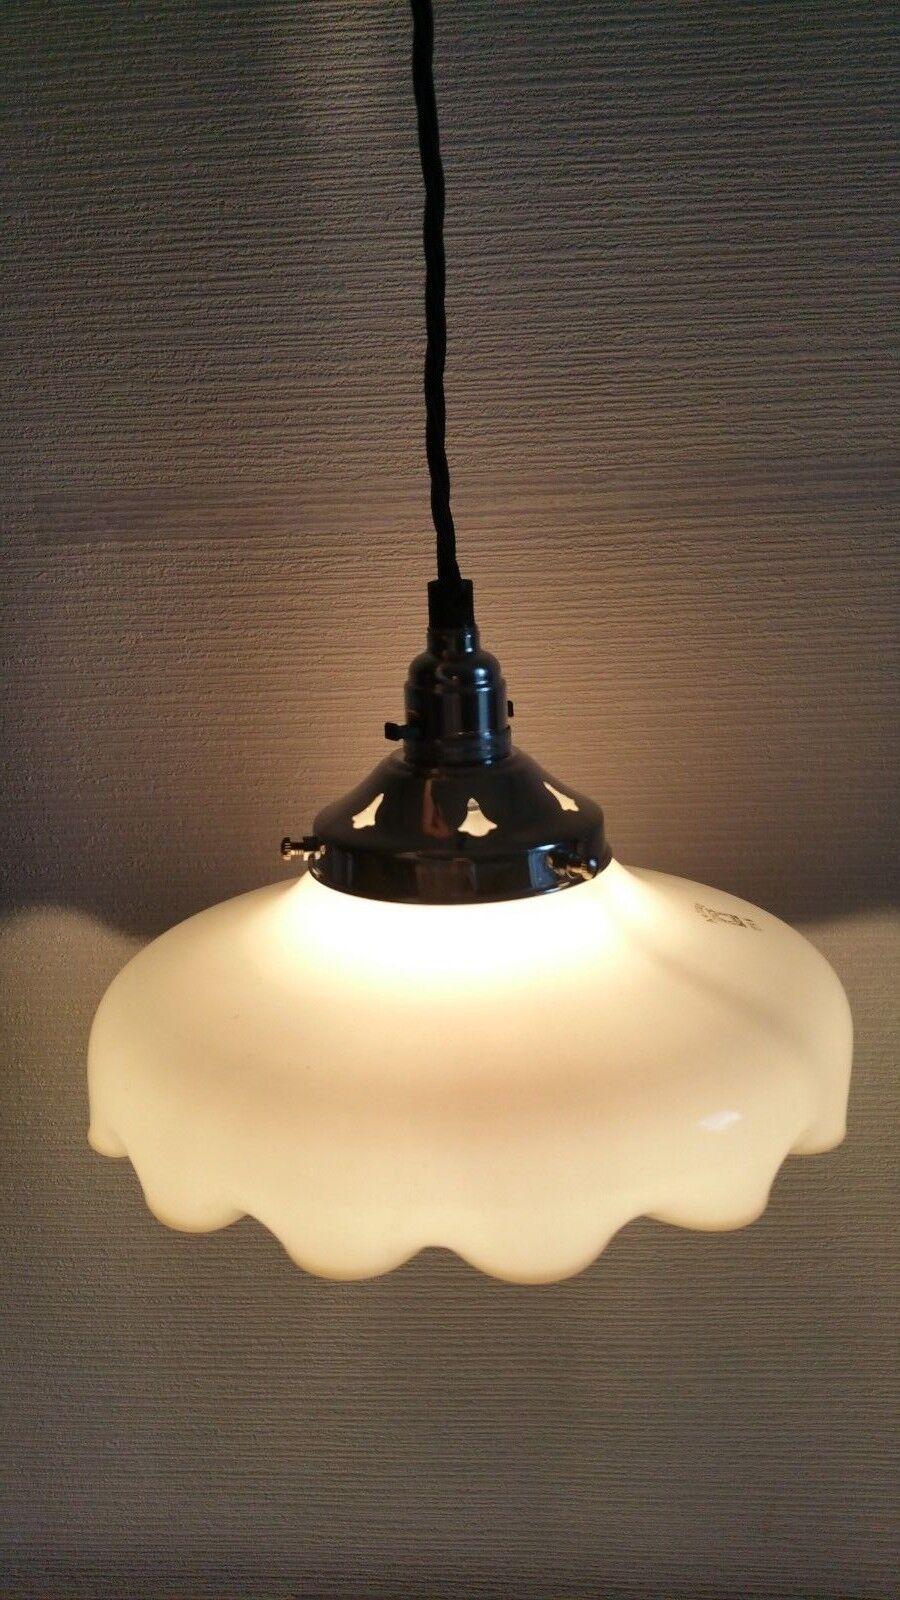 GerFemme vintage SCHOTT & Glass GEN JENA autosit Blanc Milk Glass & Ceiling Light Shade d06bdd